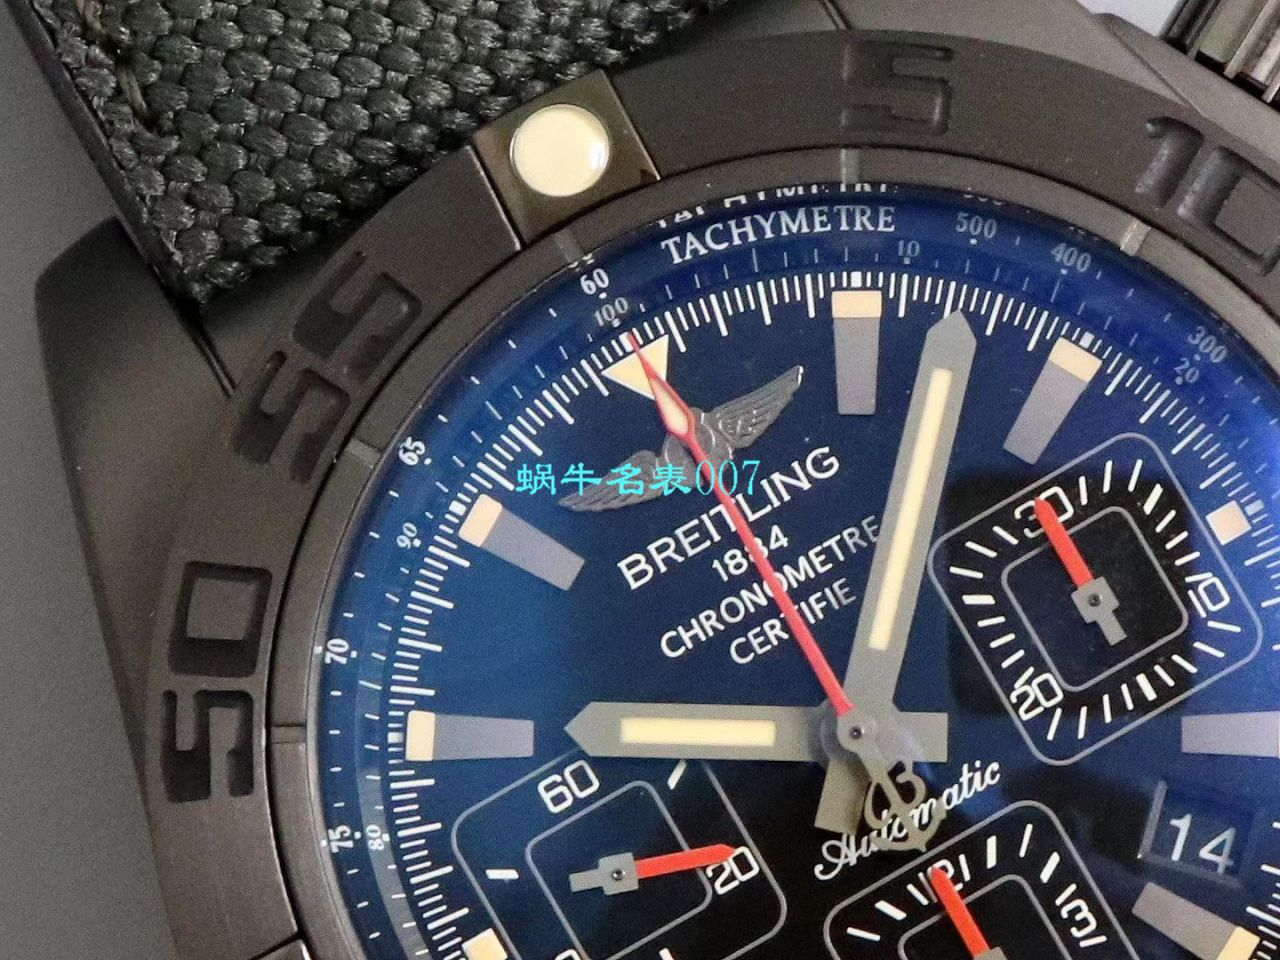 【GF厂Breitling大黄蜂复刻手表】百年灵机械计时系列MB0111C3|I531|262S|M20DSA.2腕表 / BL112